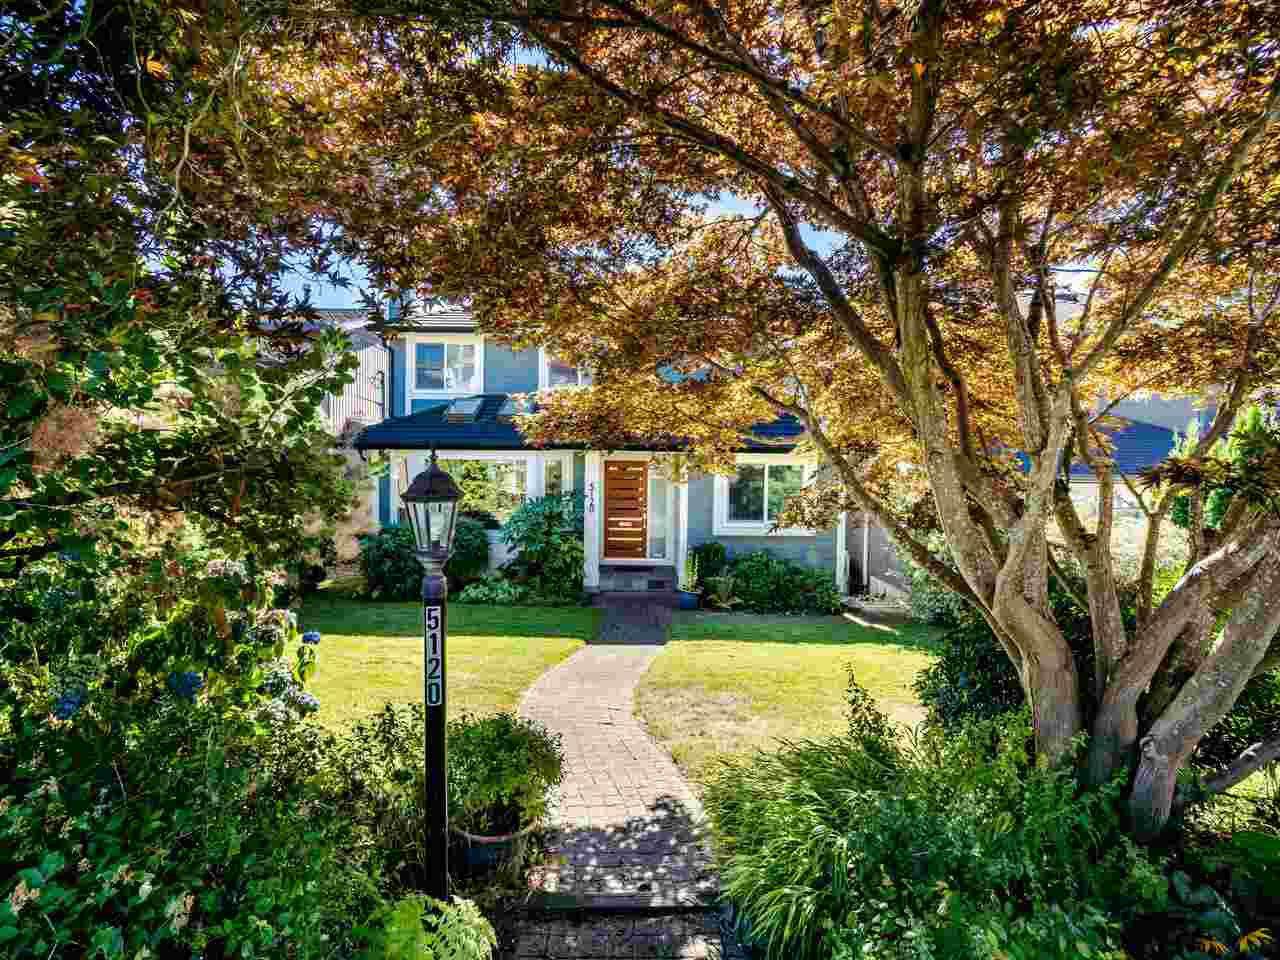 Your new home awaits at 5120 Ewart Street!